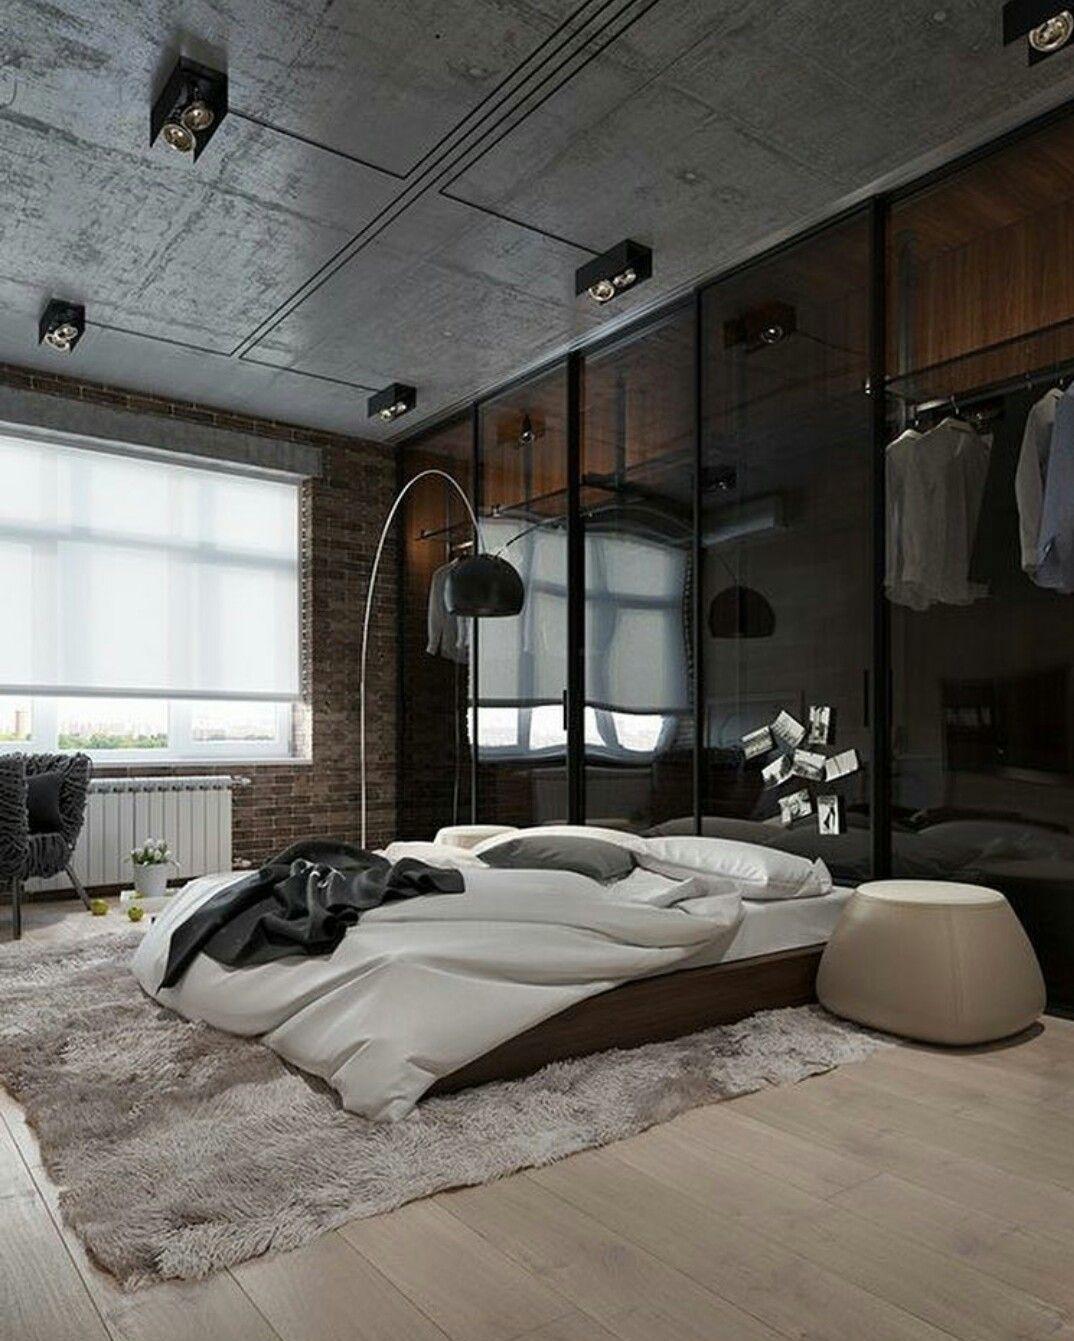 Pin von MİMAR SİNAN auf BEDROOMS/YATAK ODALARI | Pinterest | Architektur